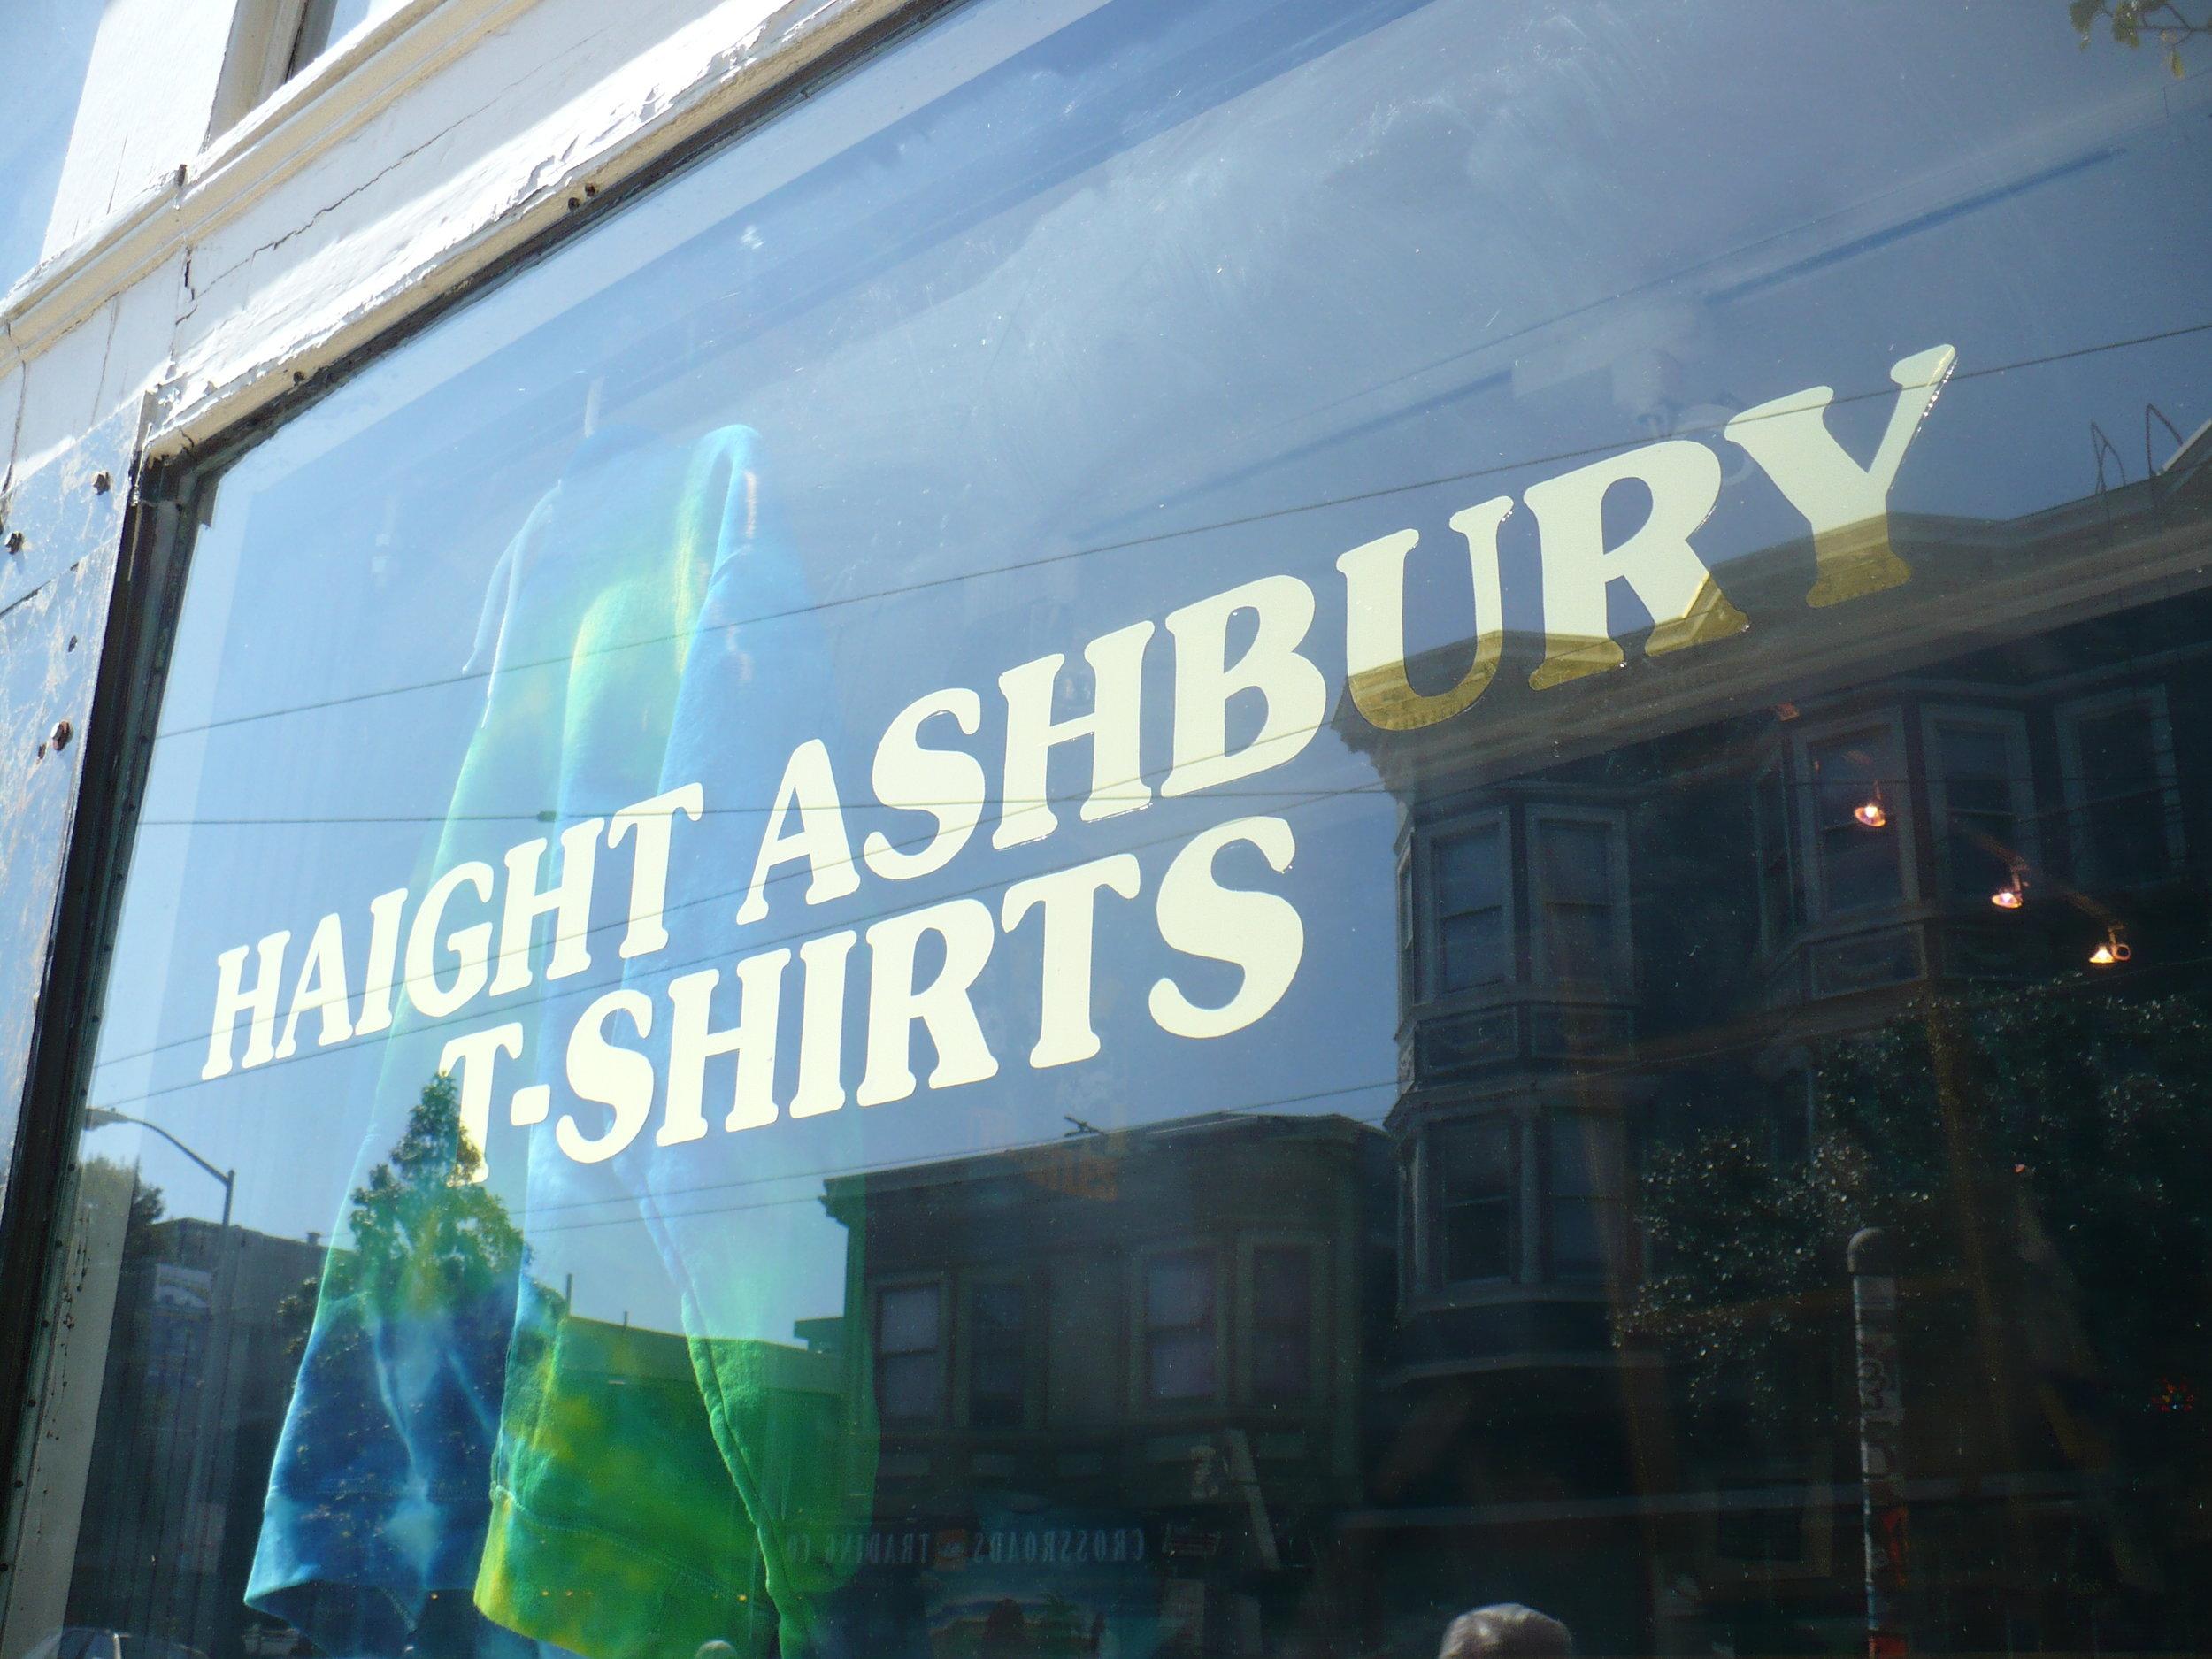 GOLD-haight-ashbury-t-shirts_3131883928_o.jpg